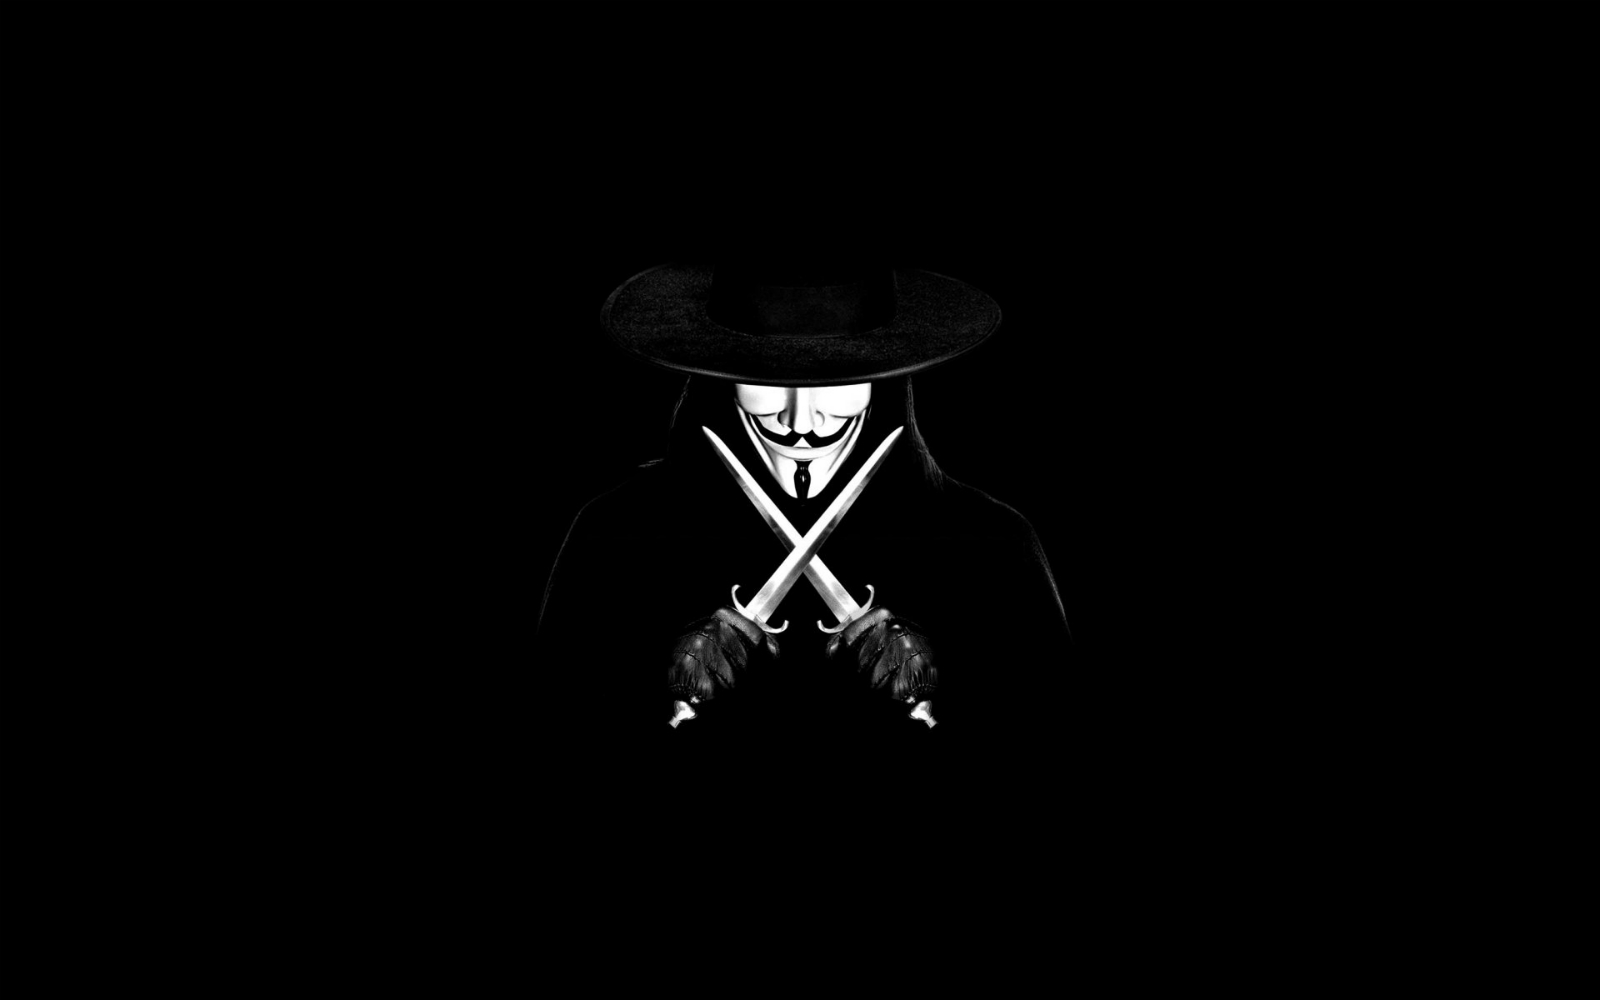 V For Vendetta Logos & Guy Fawkes Mask HD Wallpapers | Desktop Wallpapers